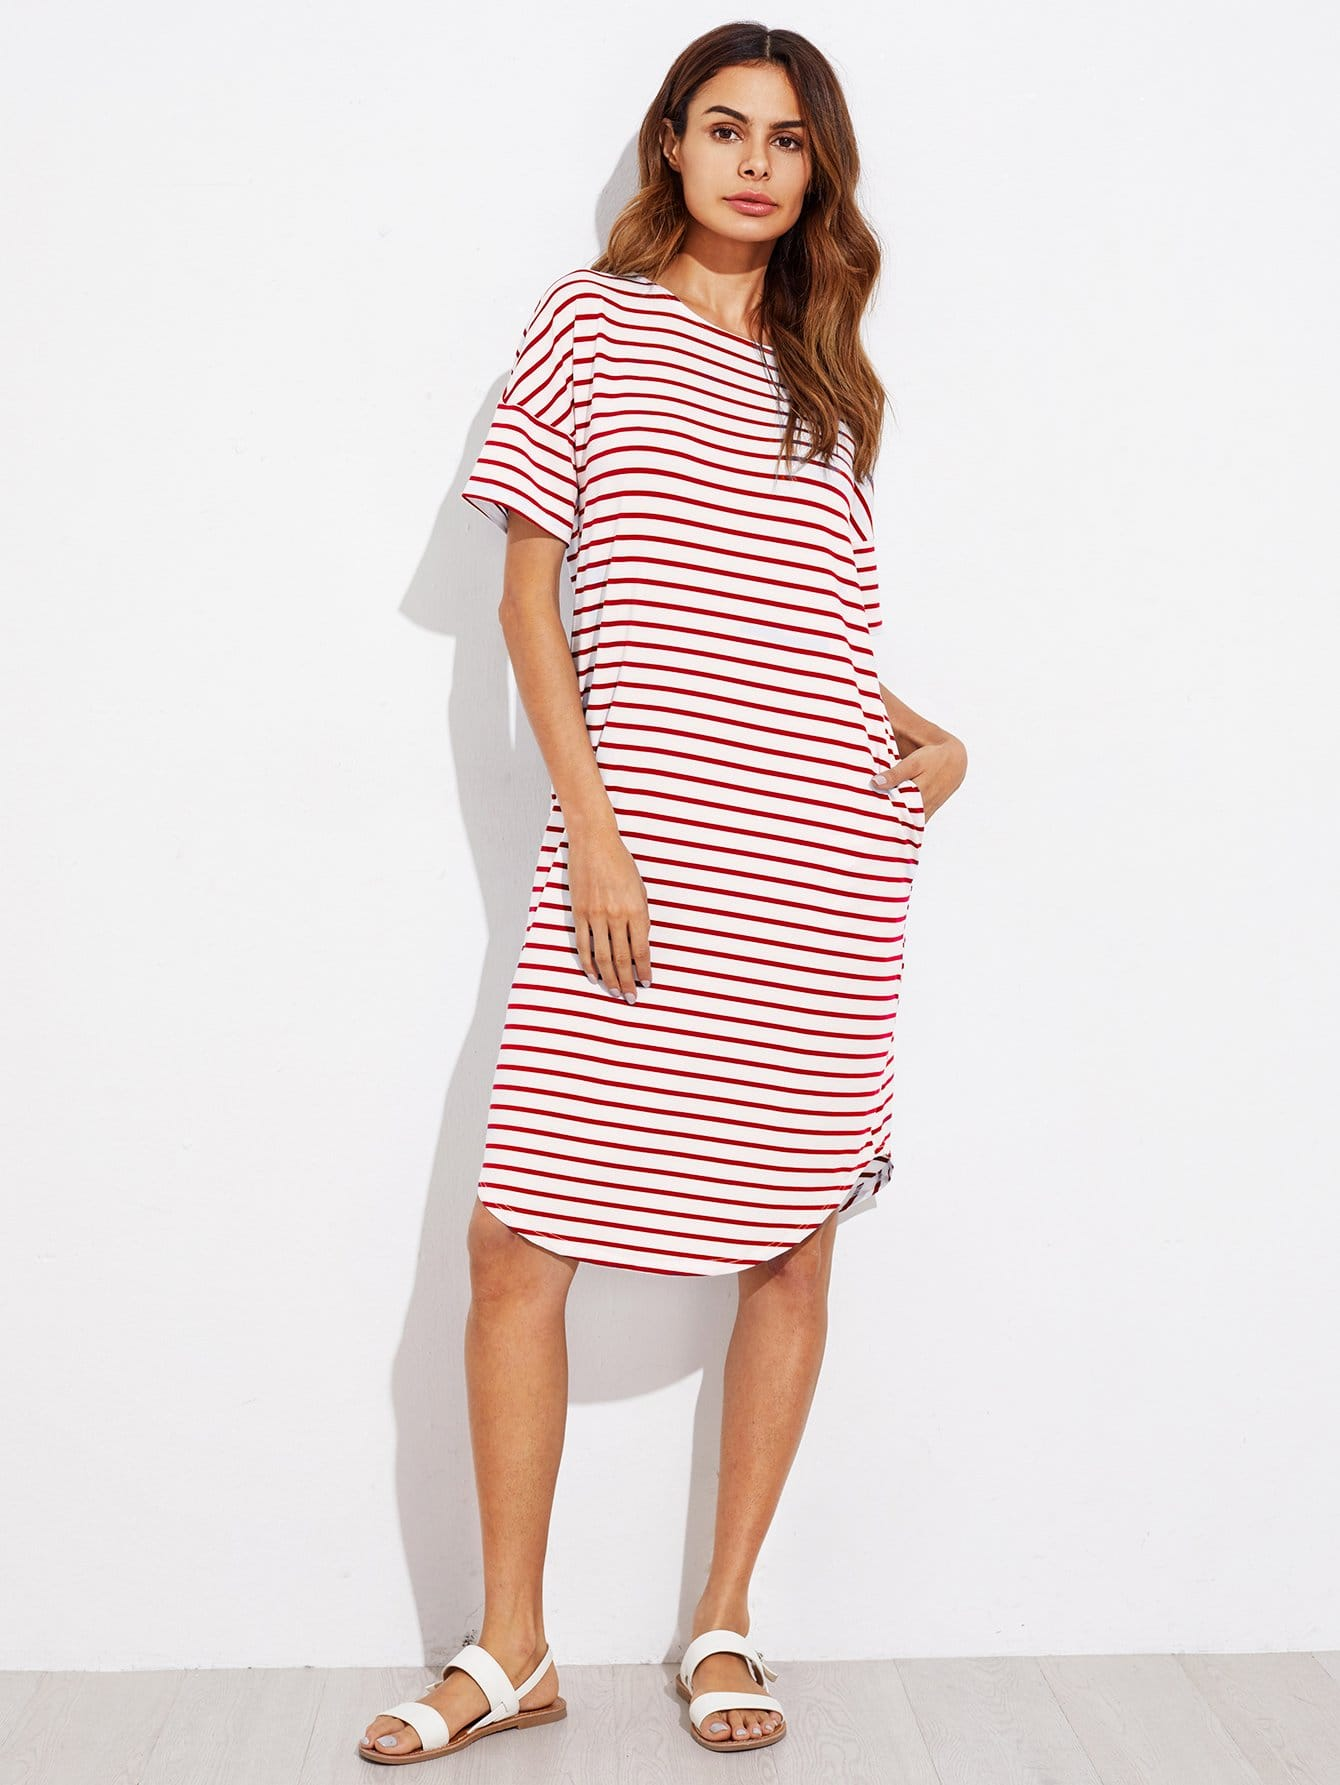 Curved Hem Striped Tee Dress batwing sleeve pocket side curved hem textured dress